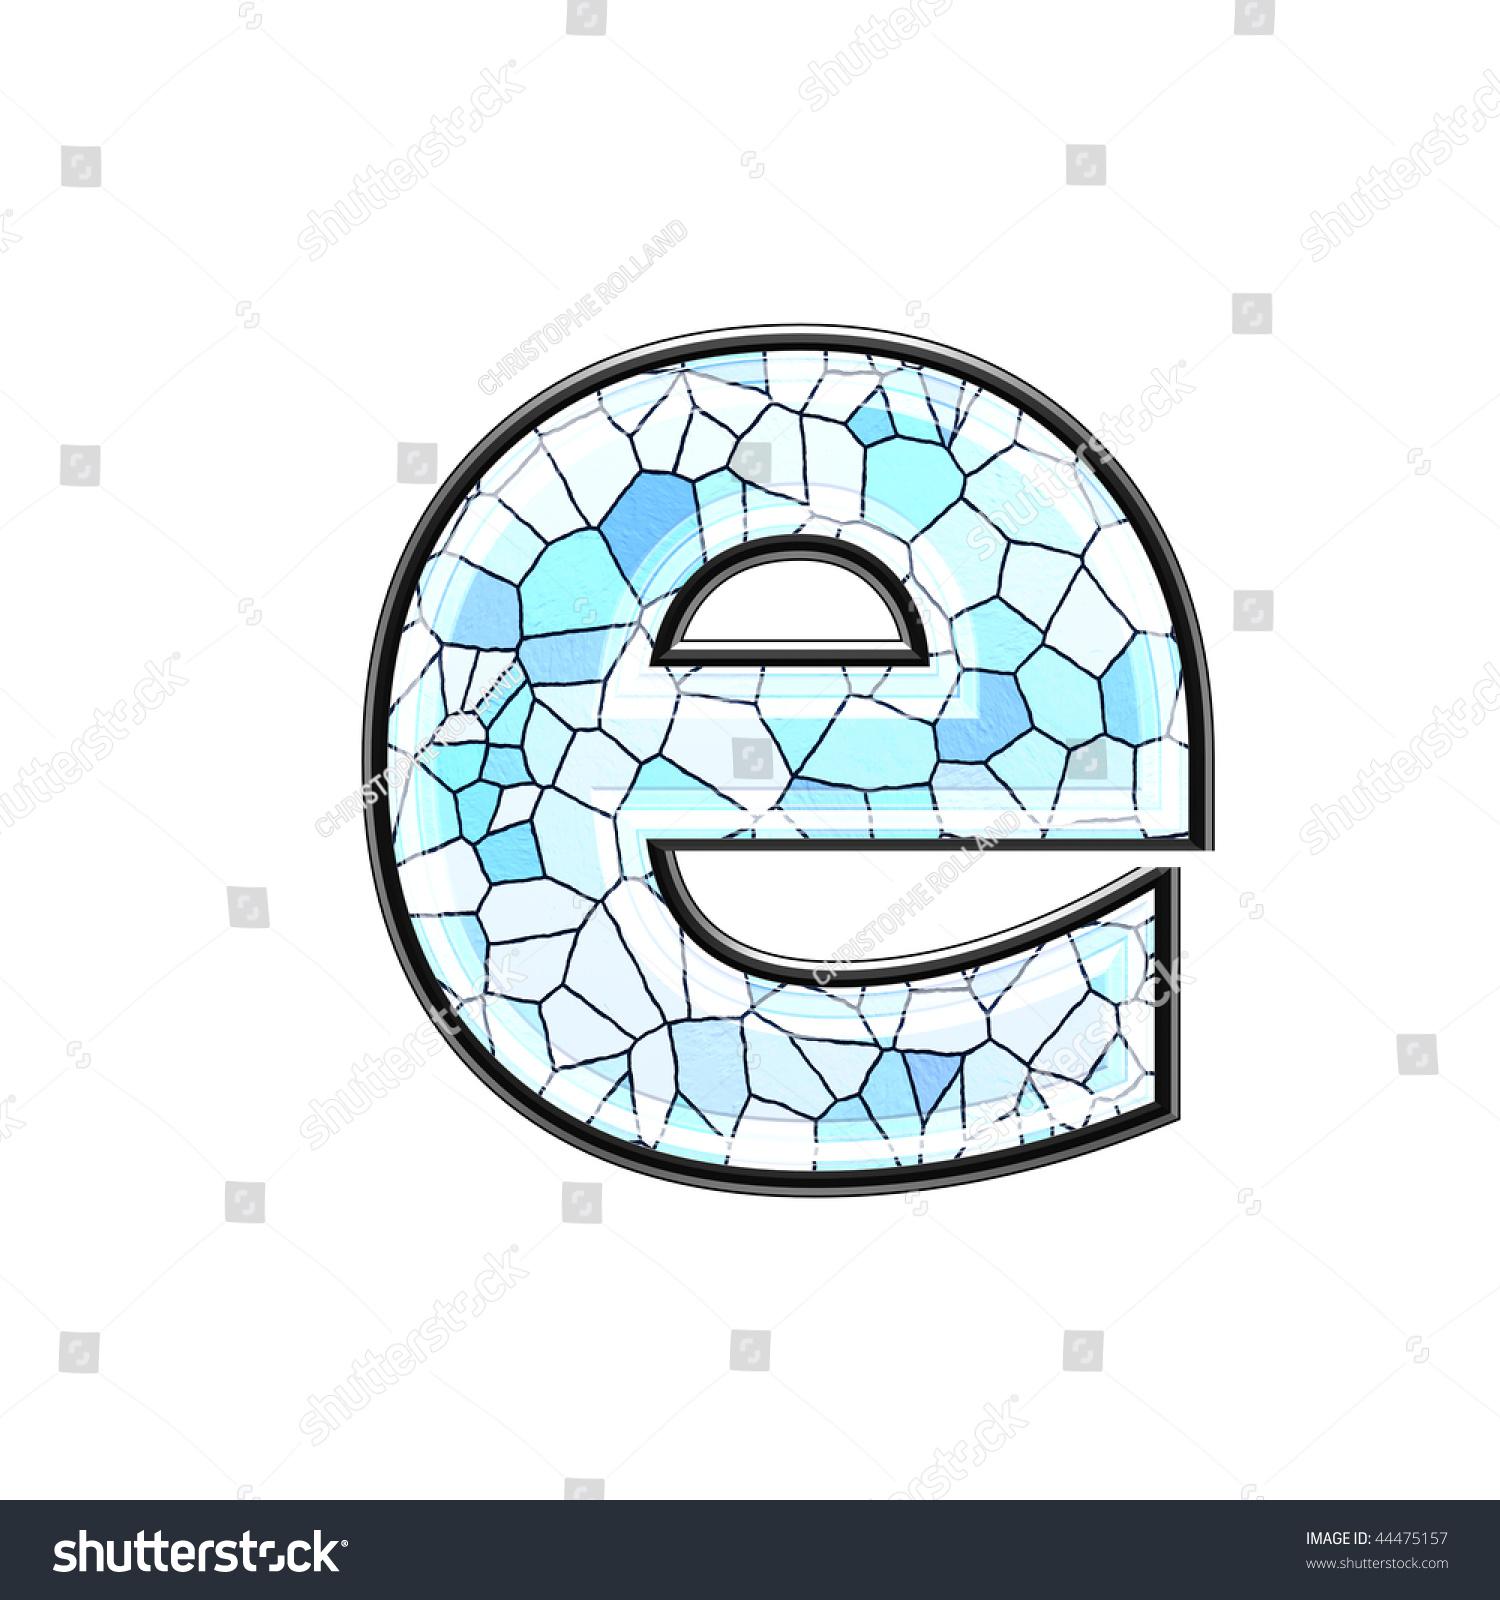 Abstract 3d letter ceramic tile texture stock illustration abstract 3d letter with ceramic tile texture e doublecrazyfo Image collections